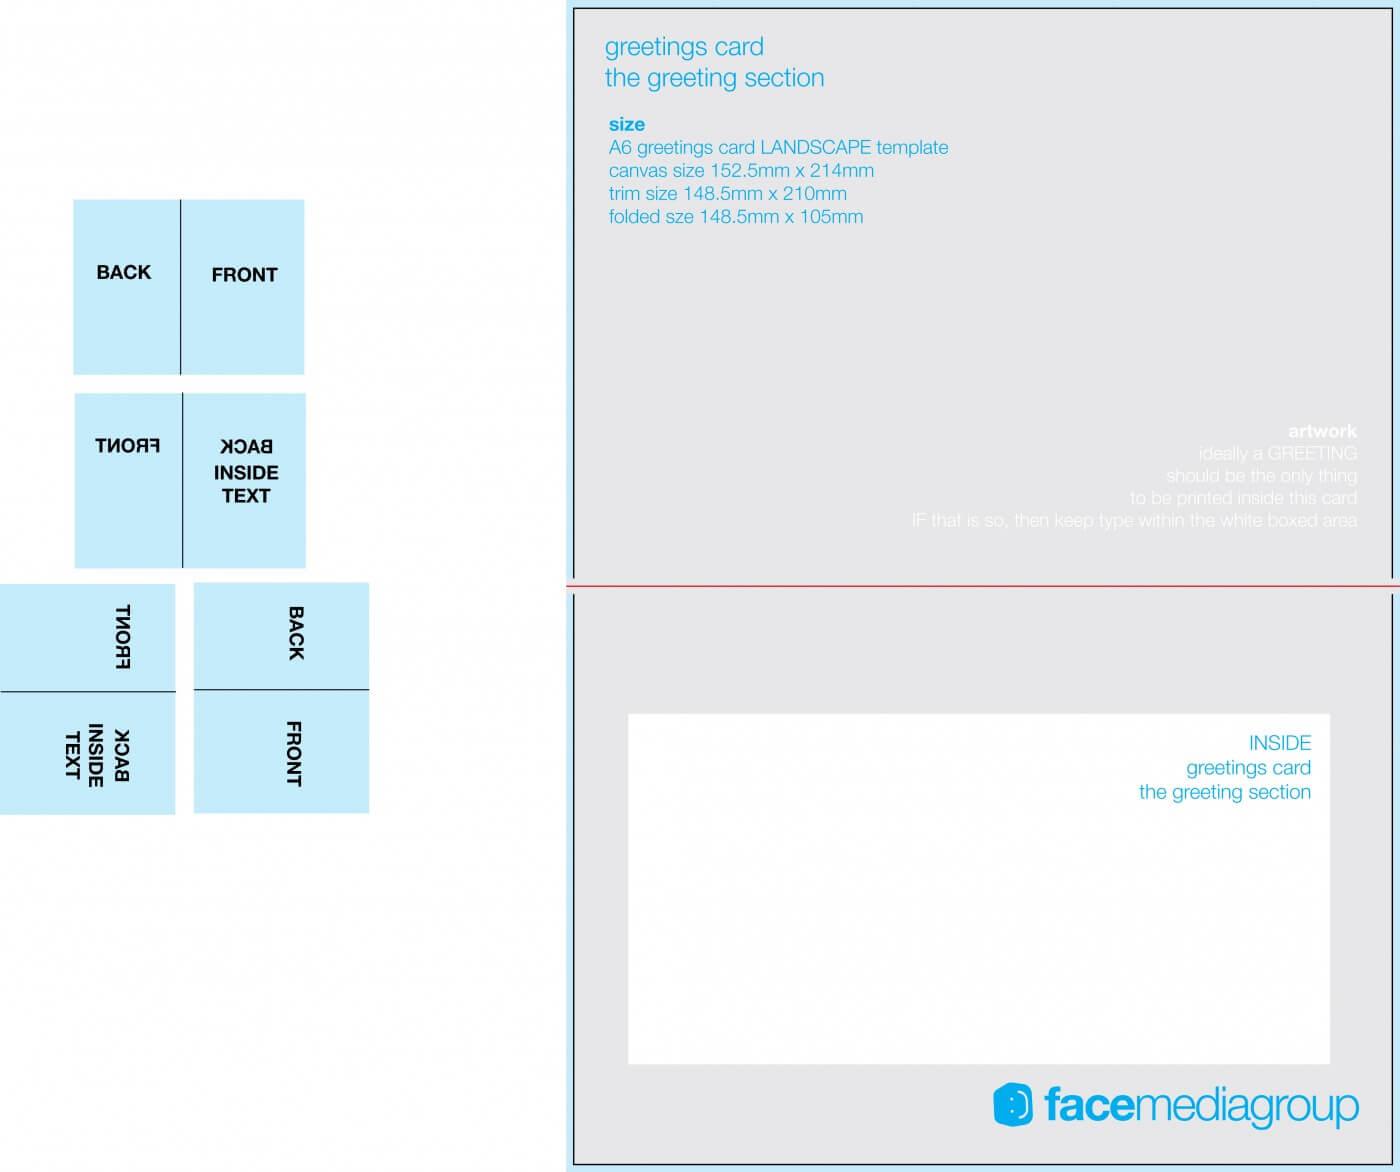 002 Template Ideas Blank Quarter Fold Card Free 1625413 Four Regarding Free Blank Greeting Card Templates For Word